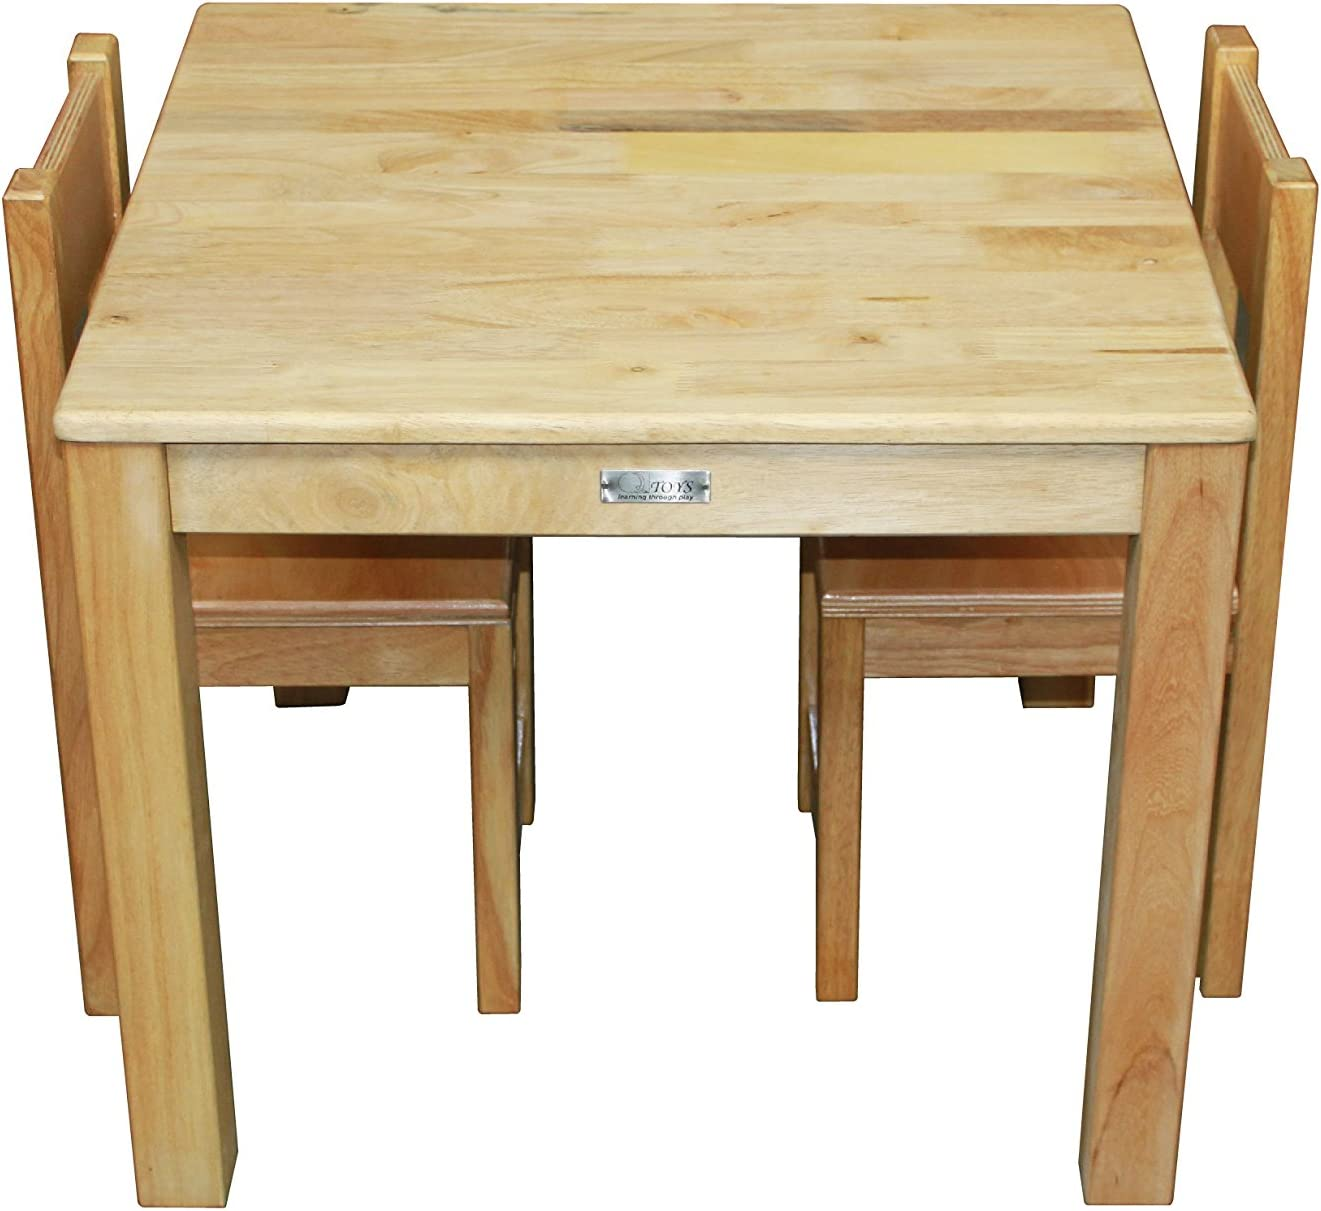 QToys Australia Standard Rubberwood Table